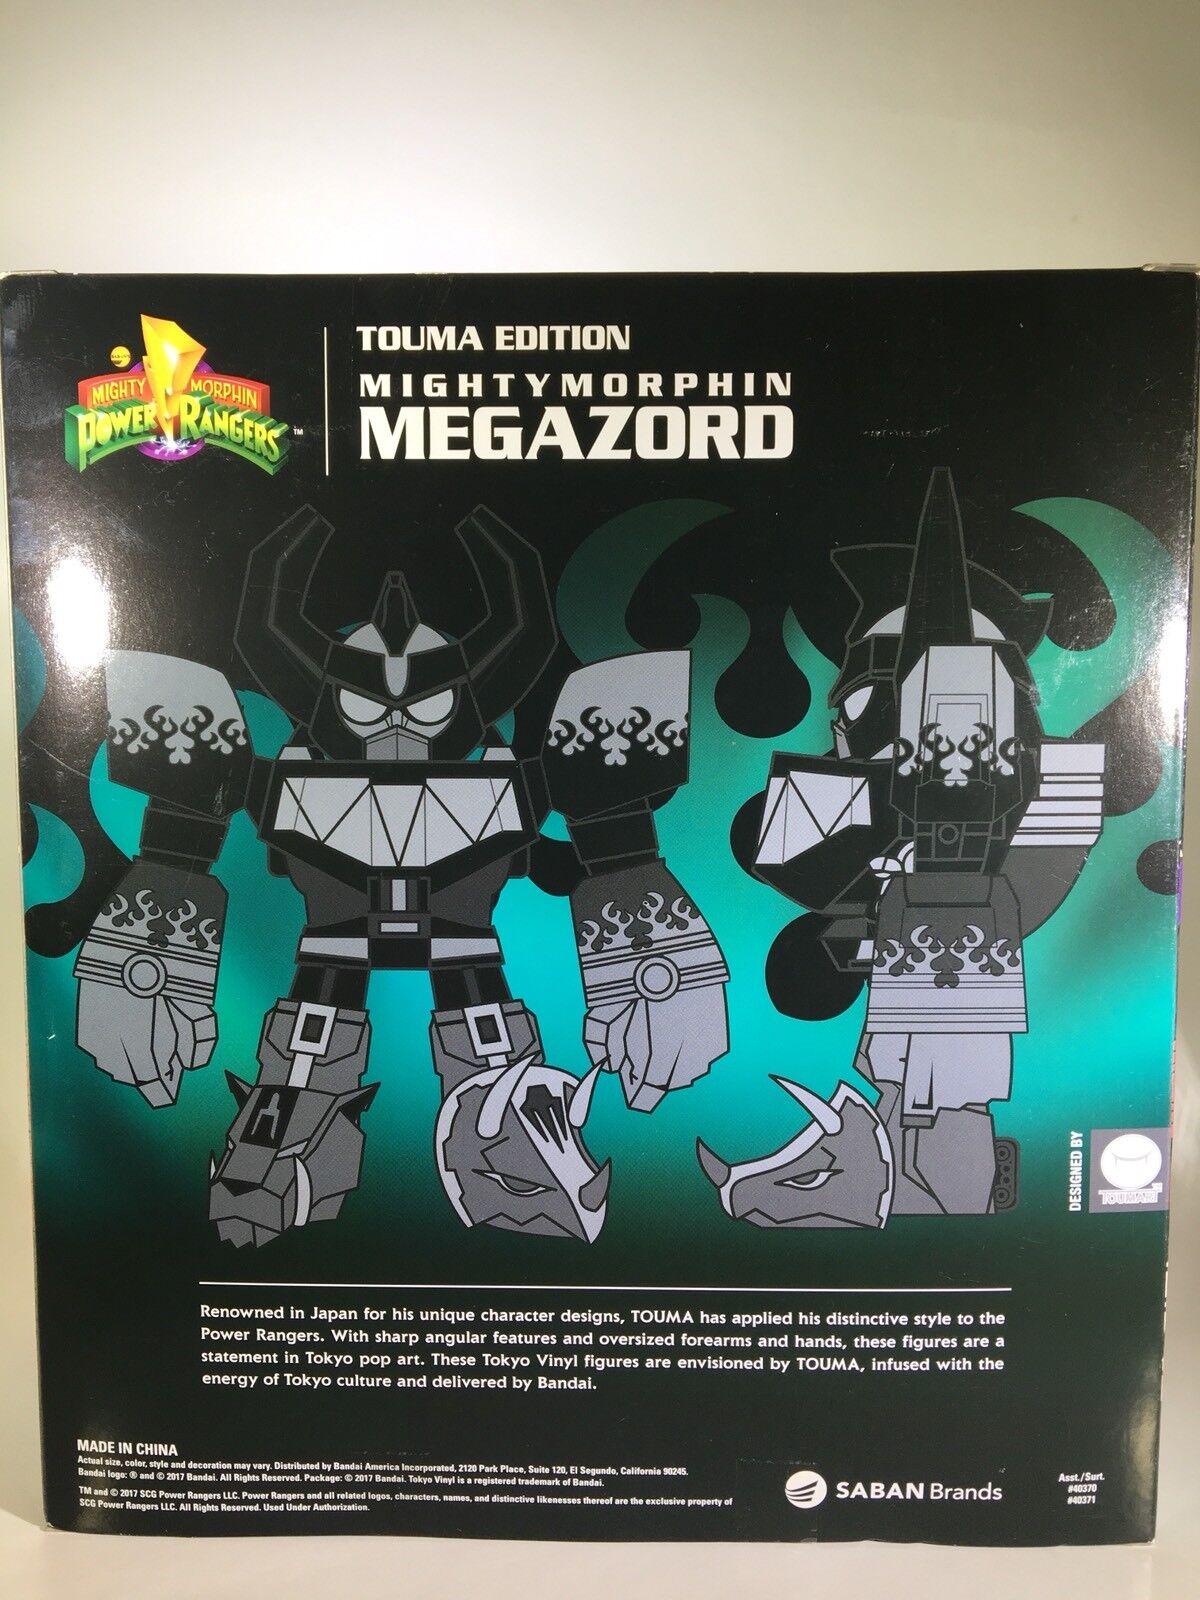 NYCC 2017 Power Rangers Bandai Tokyo Tokyo Tokyo Vinyl Limited Megazord 550 LE 744b61